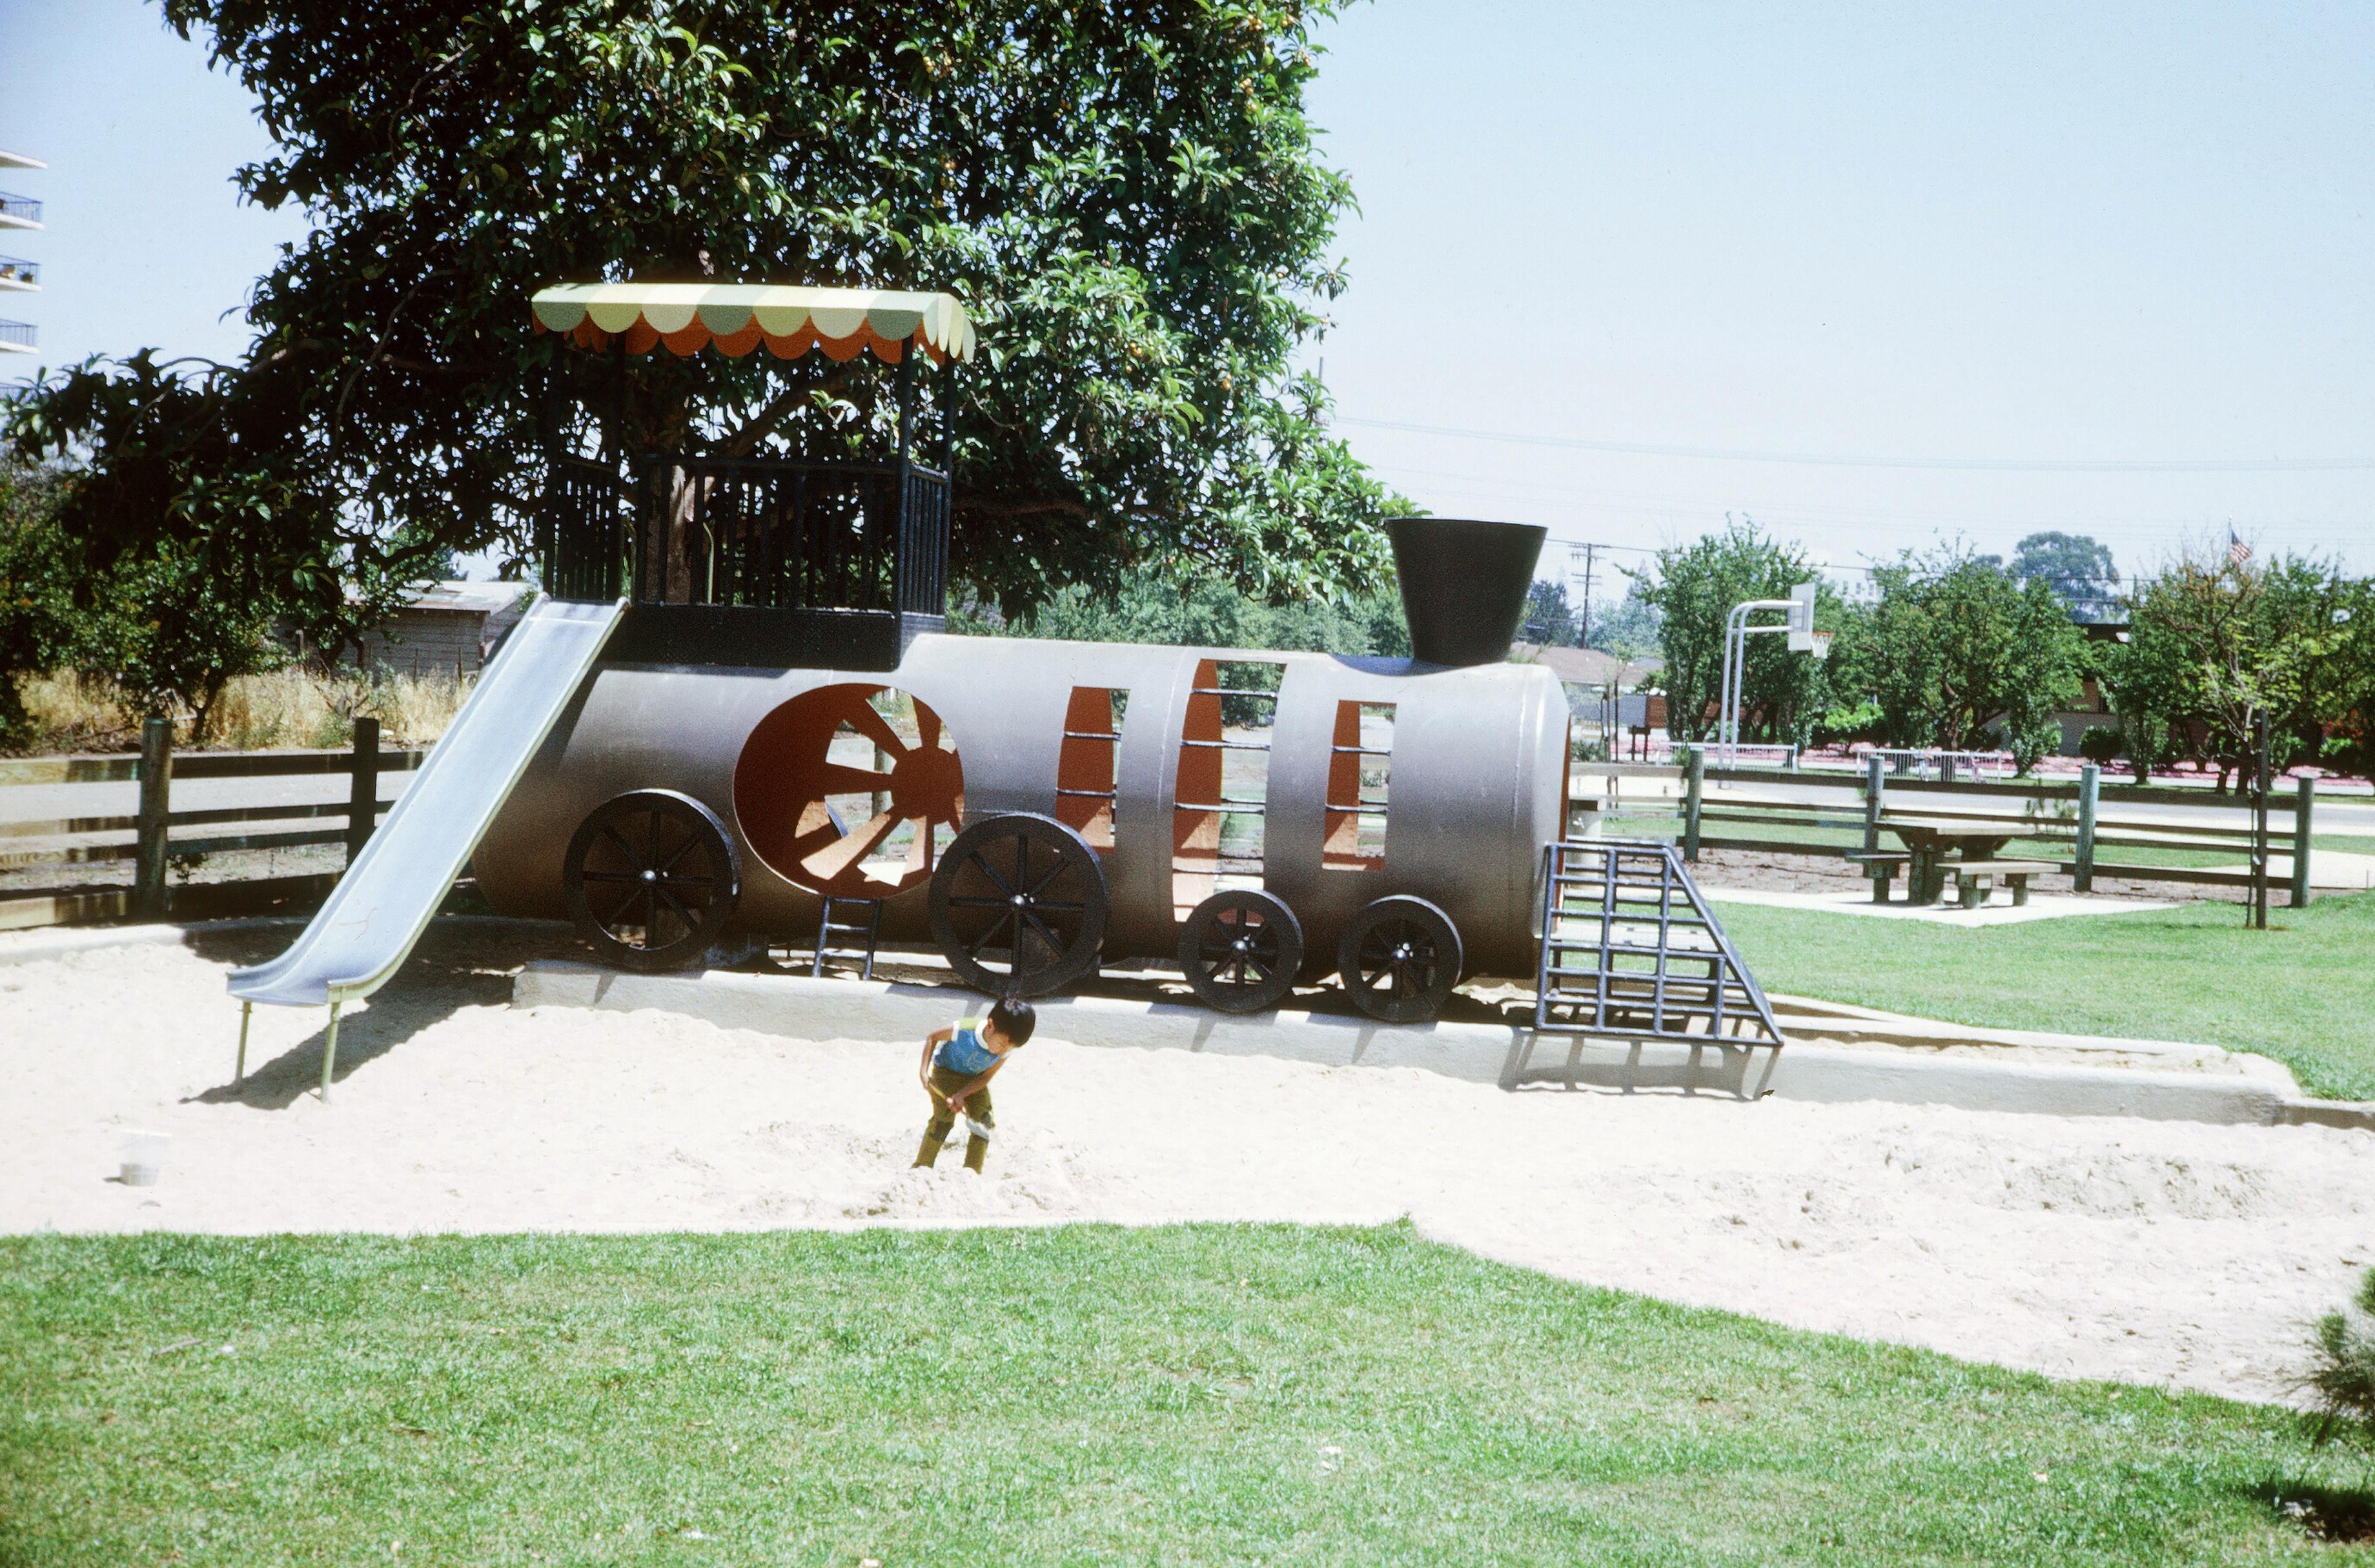 Juana Briones Park, Palo Alto (May 1969), 1969, California, Car, Grass, HQ Photo